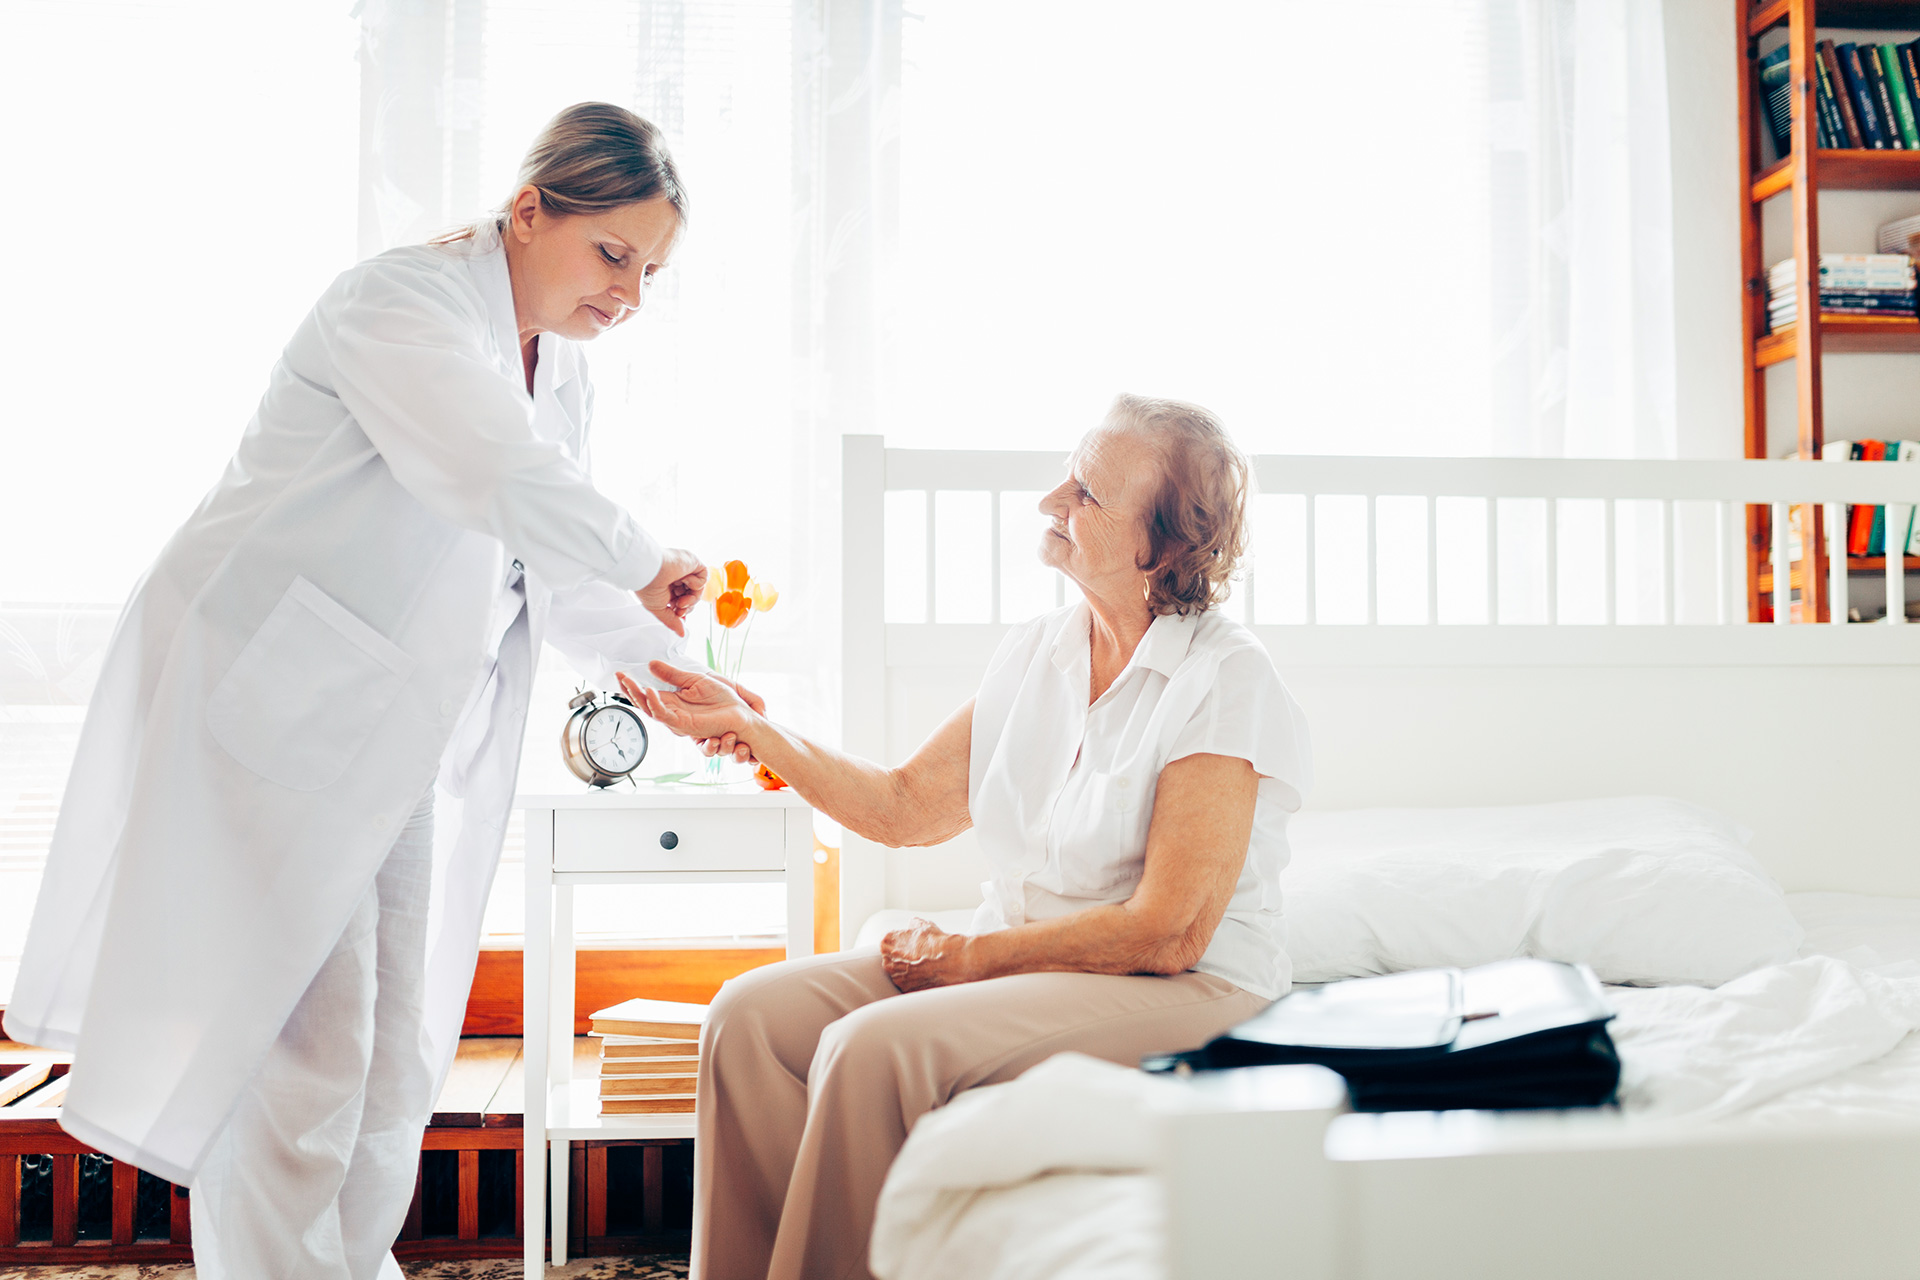 providing-care-for-elderly-doctor-visiting-P76YEJ6